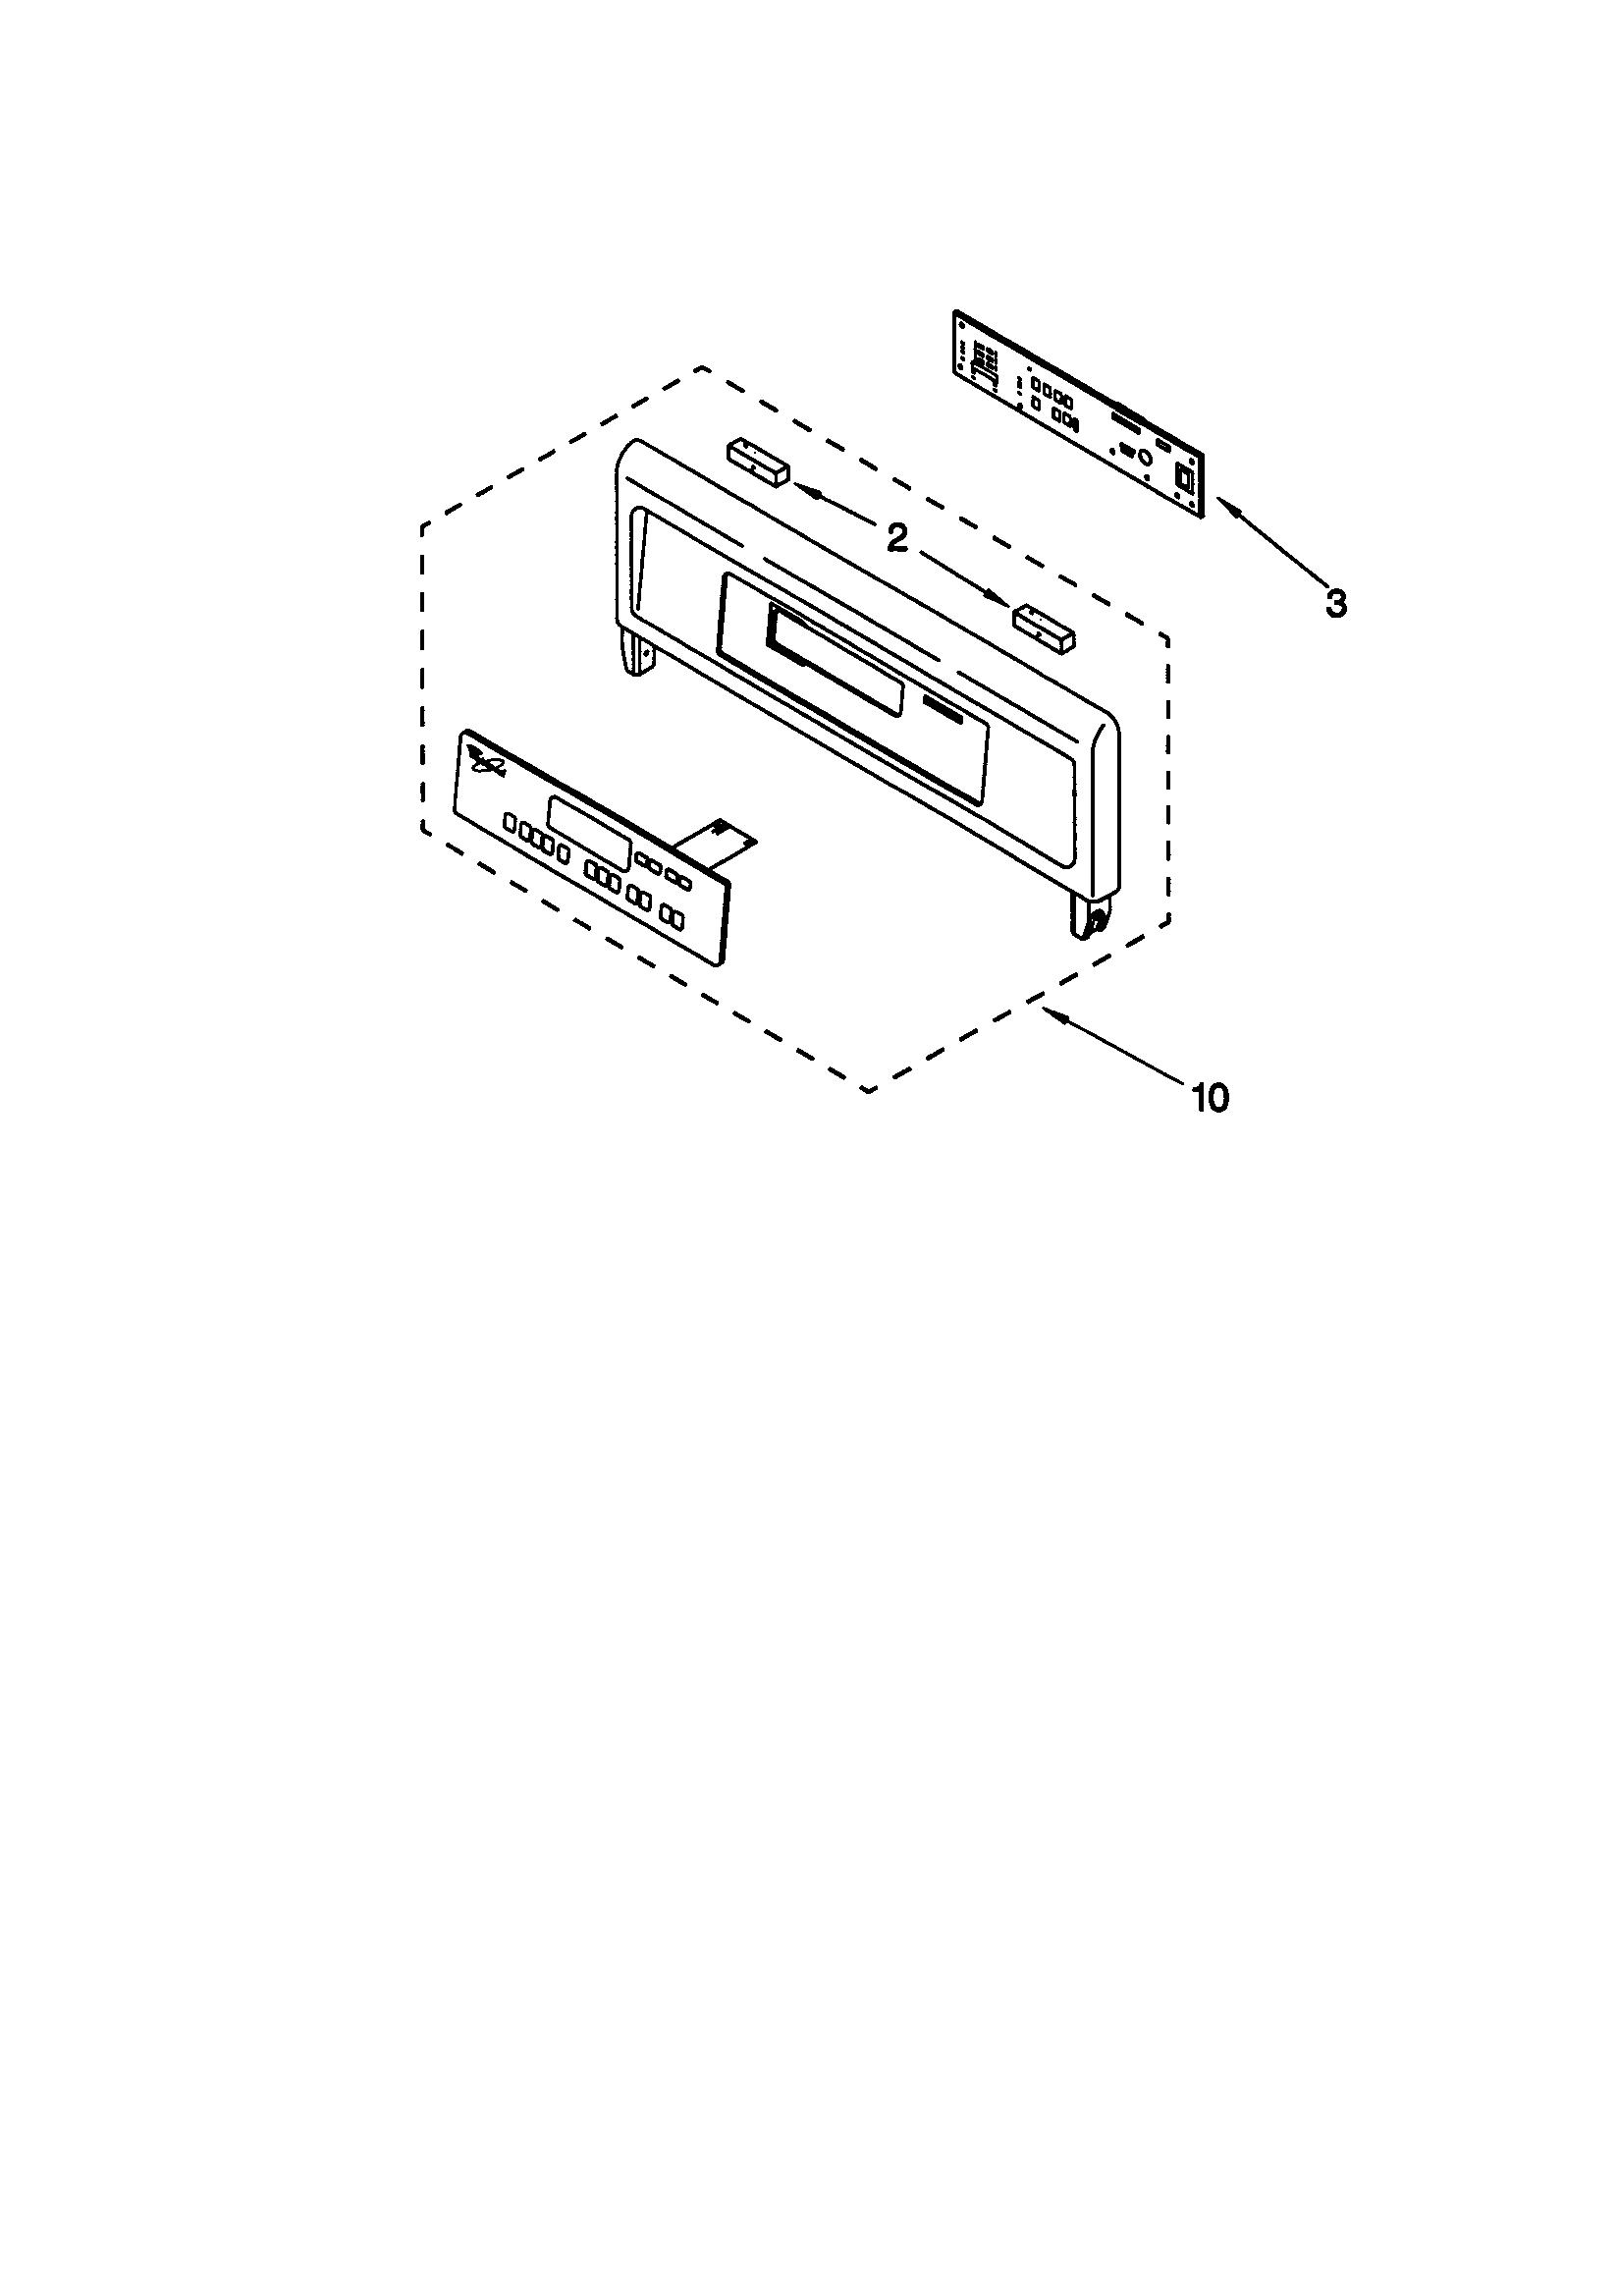 Microwave Mechanical Timer Wiring Diagram - Wiring Diagram